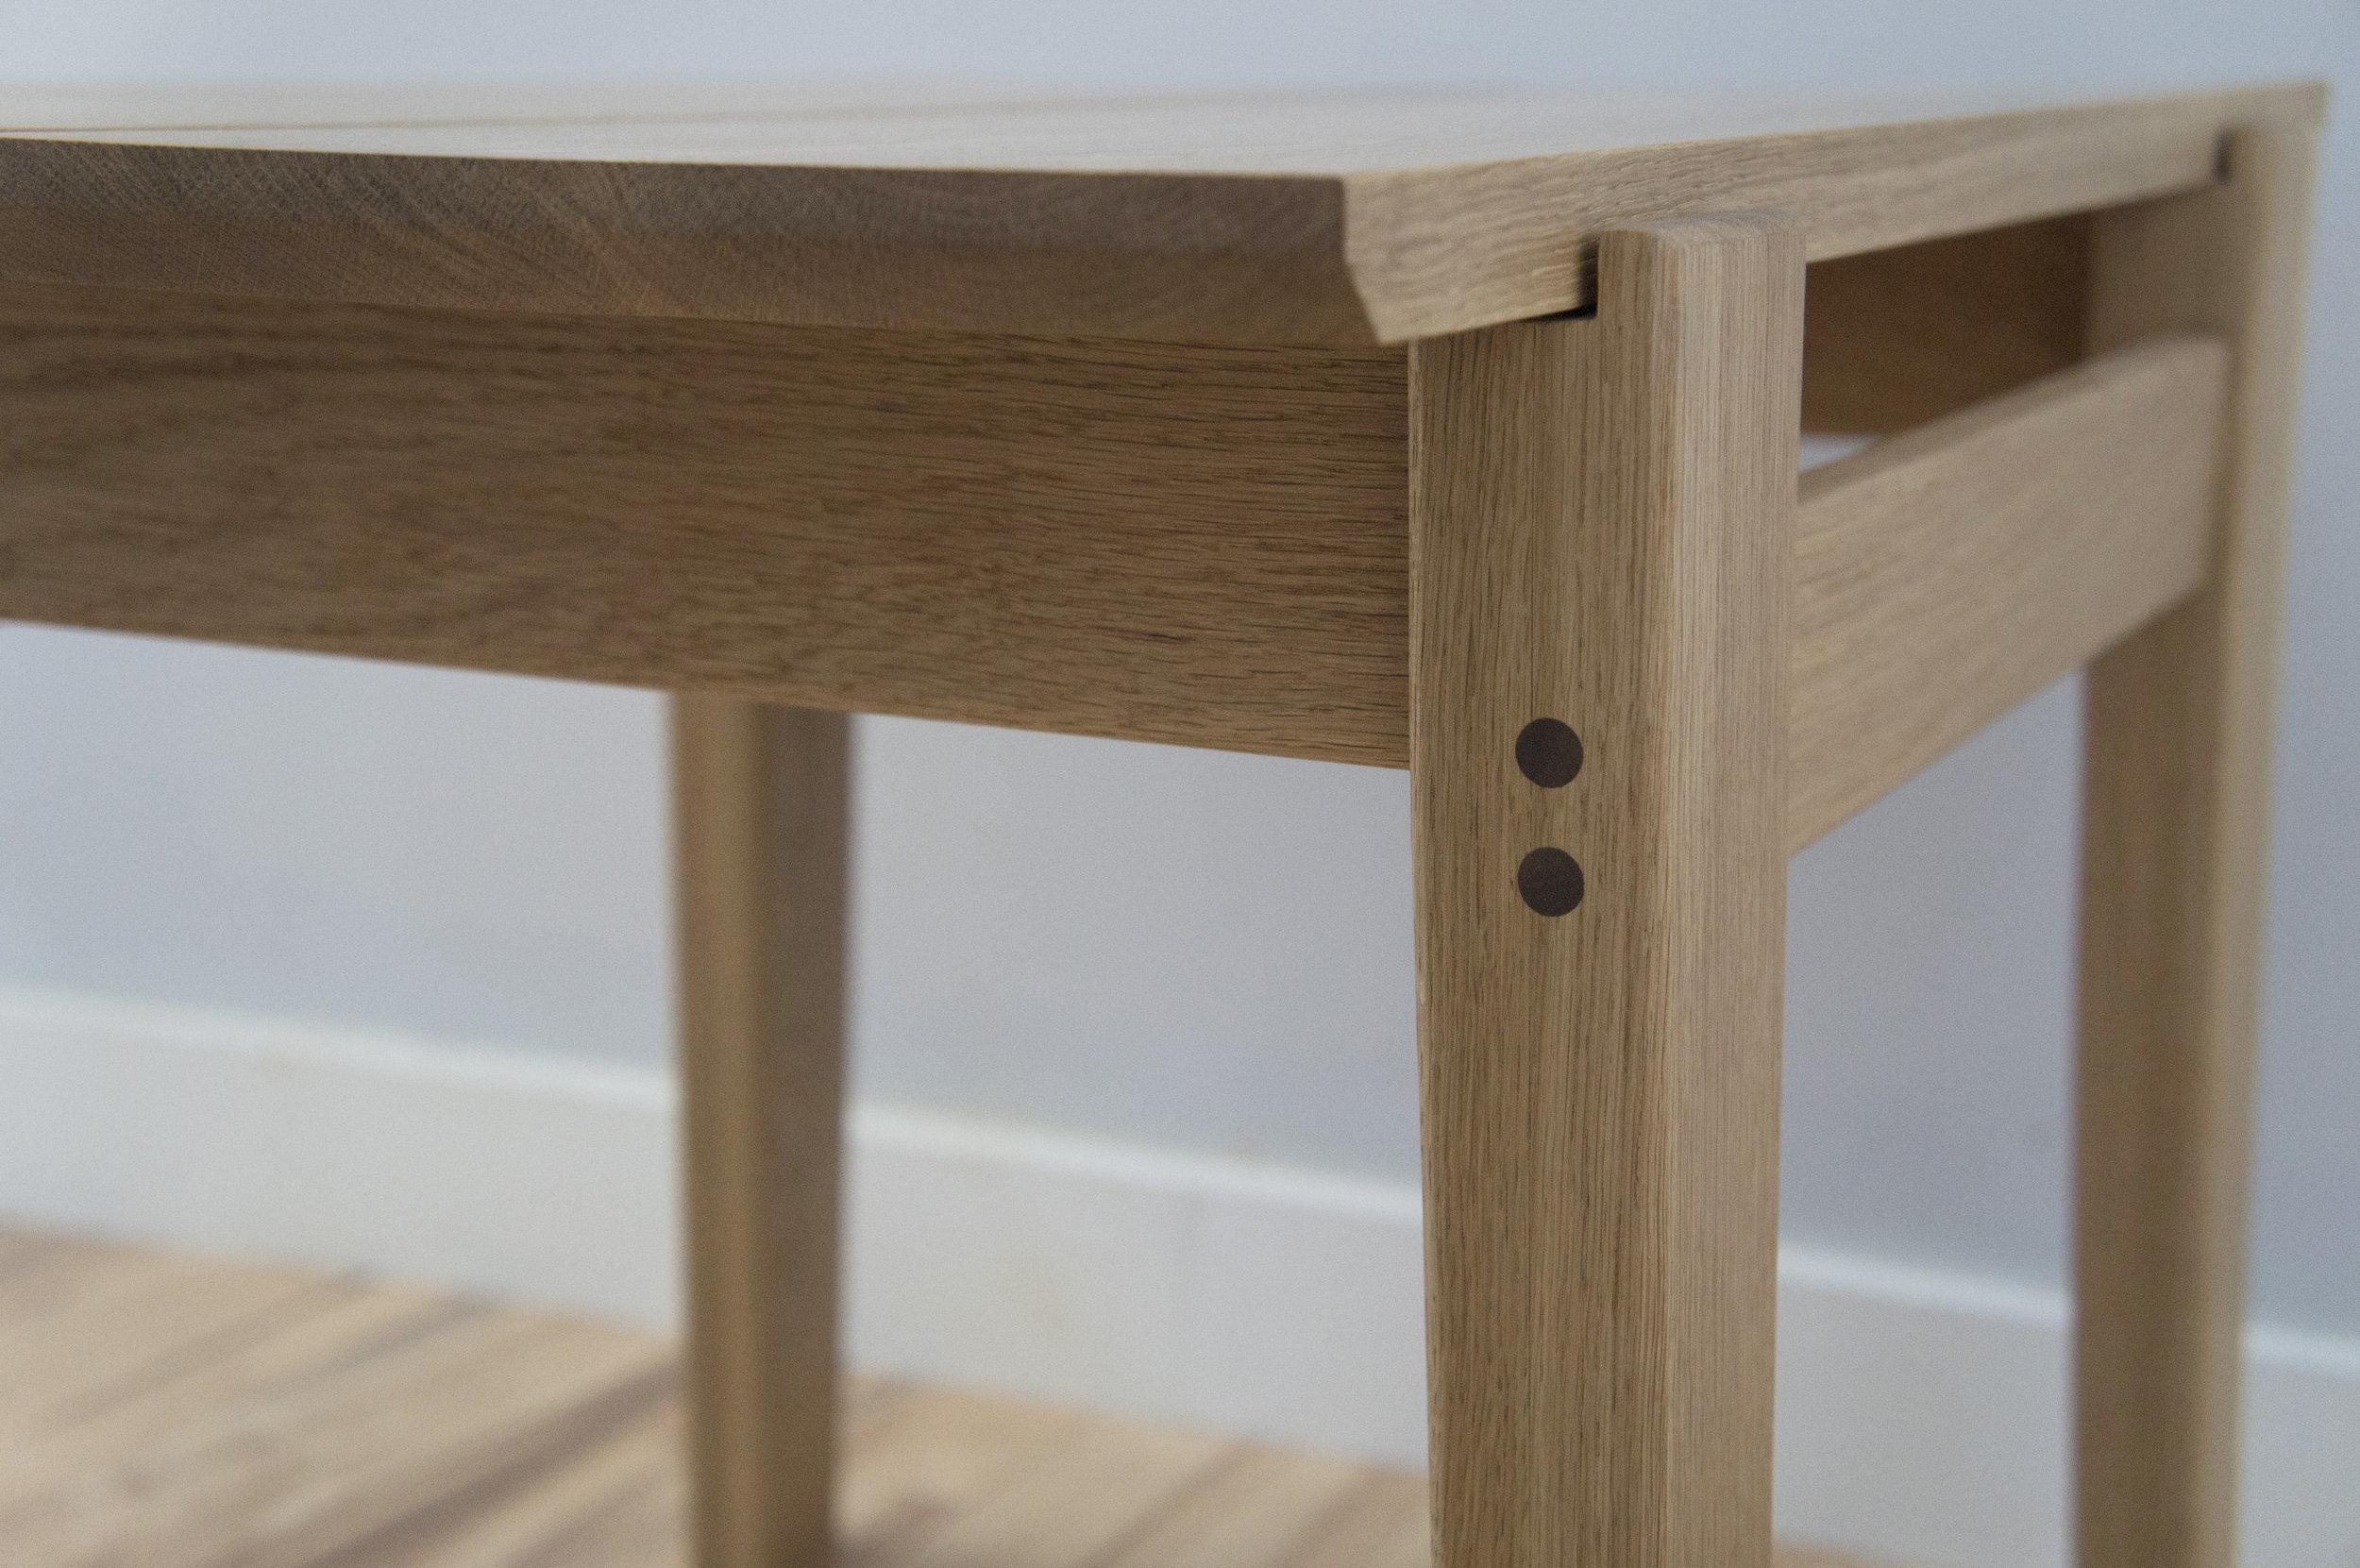 Bench-close up-details.jpg